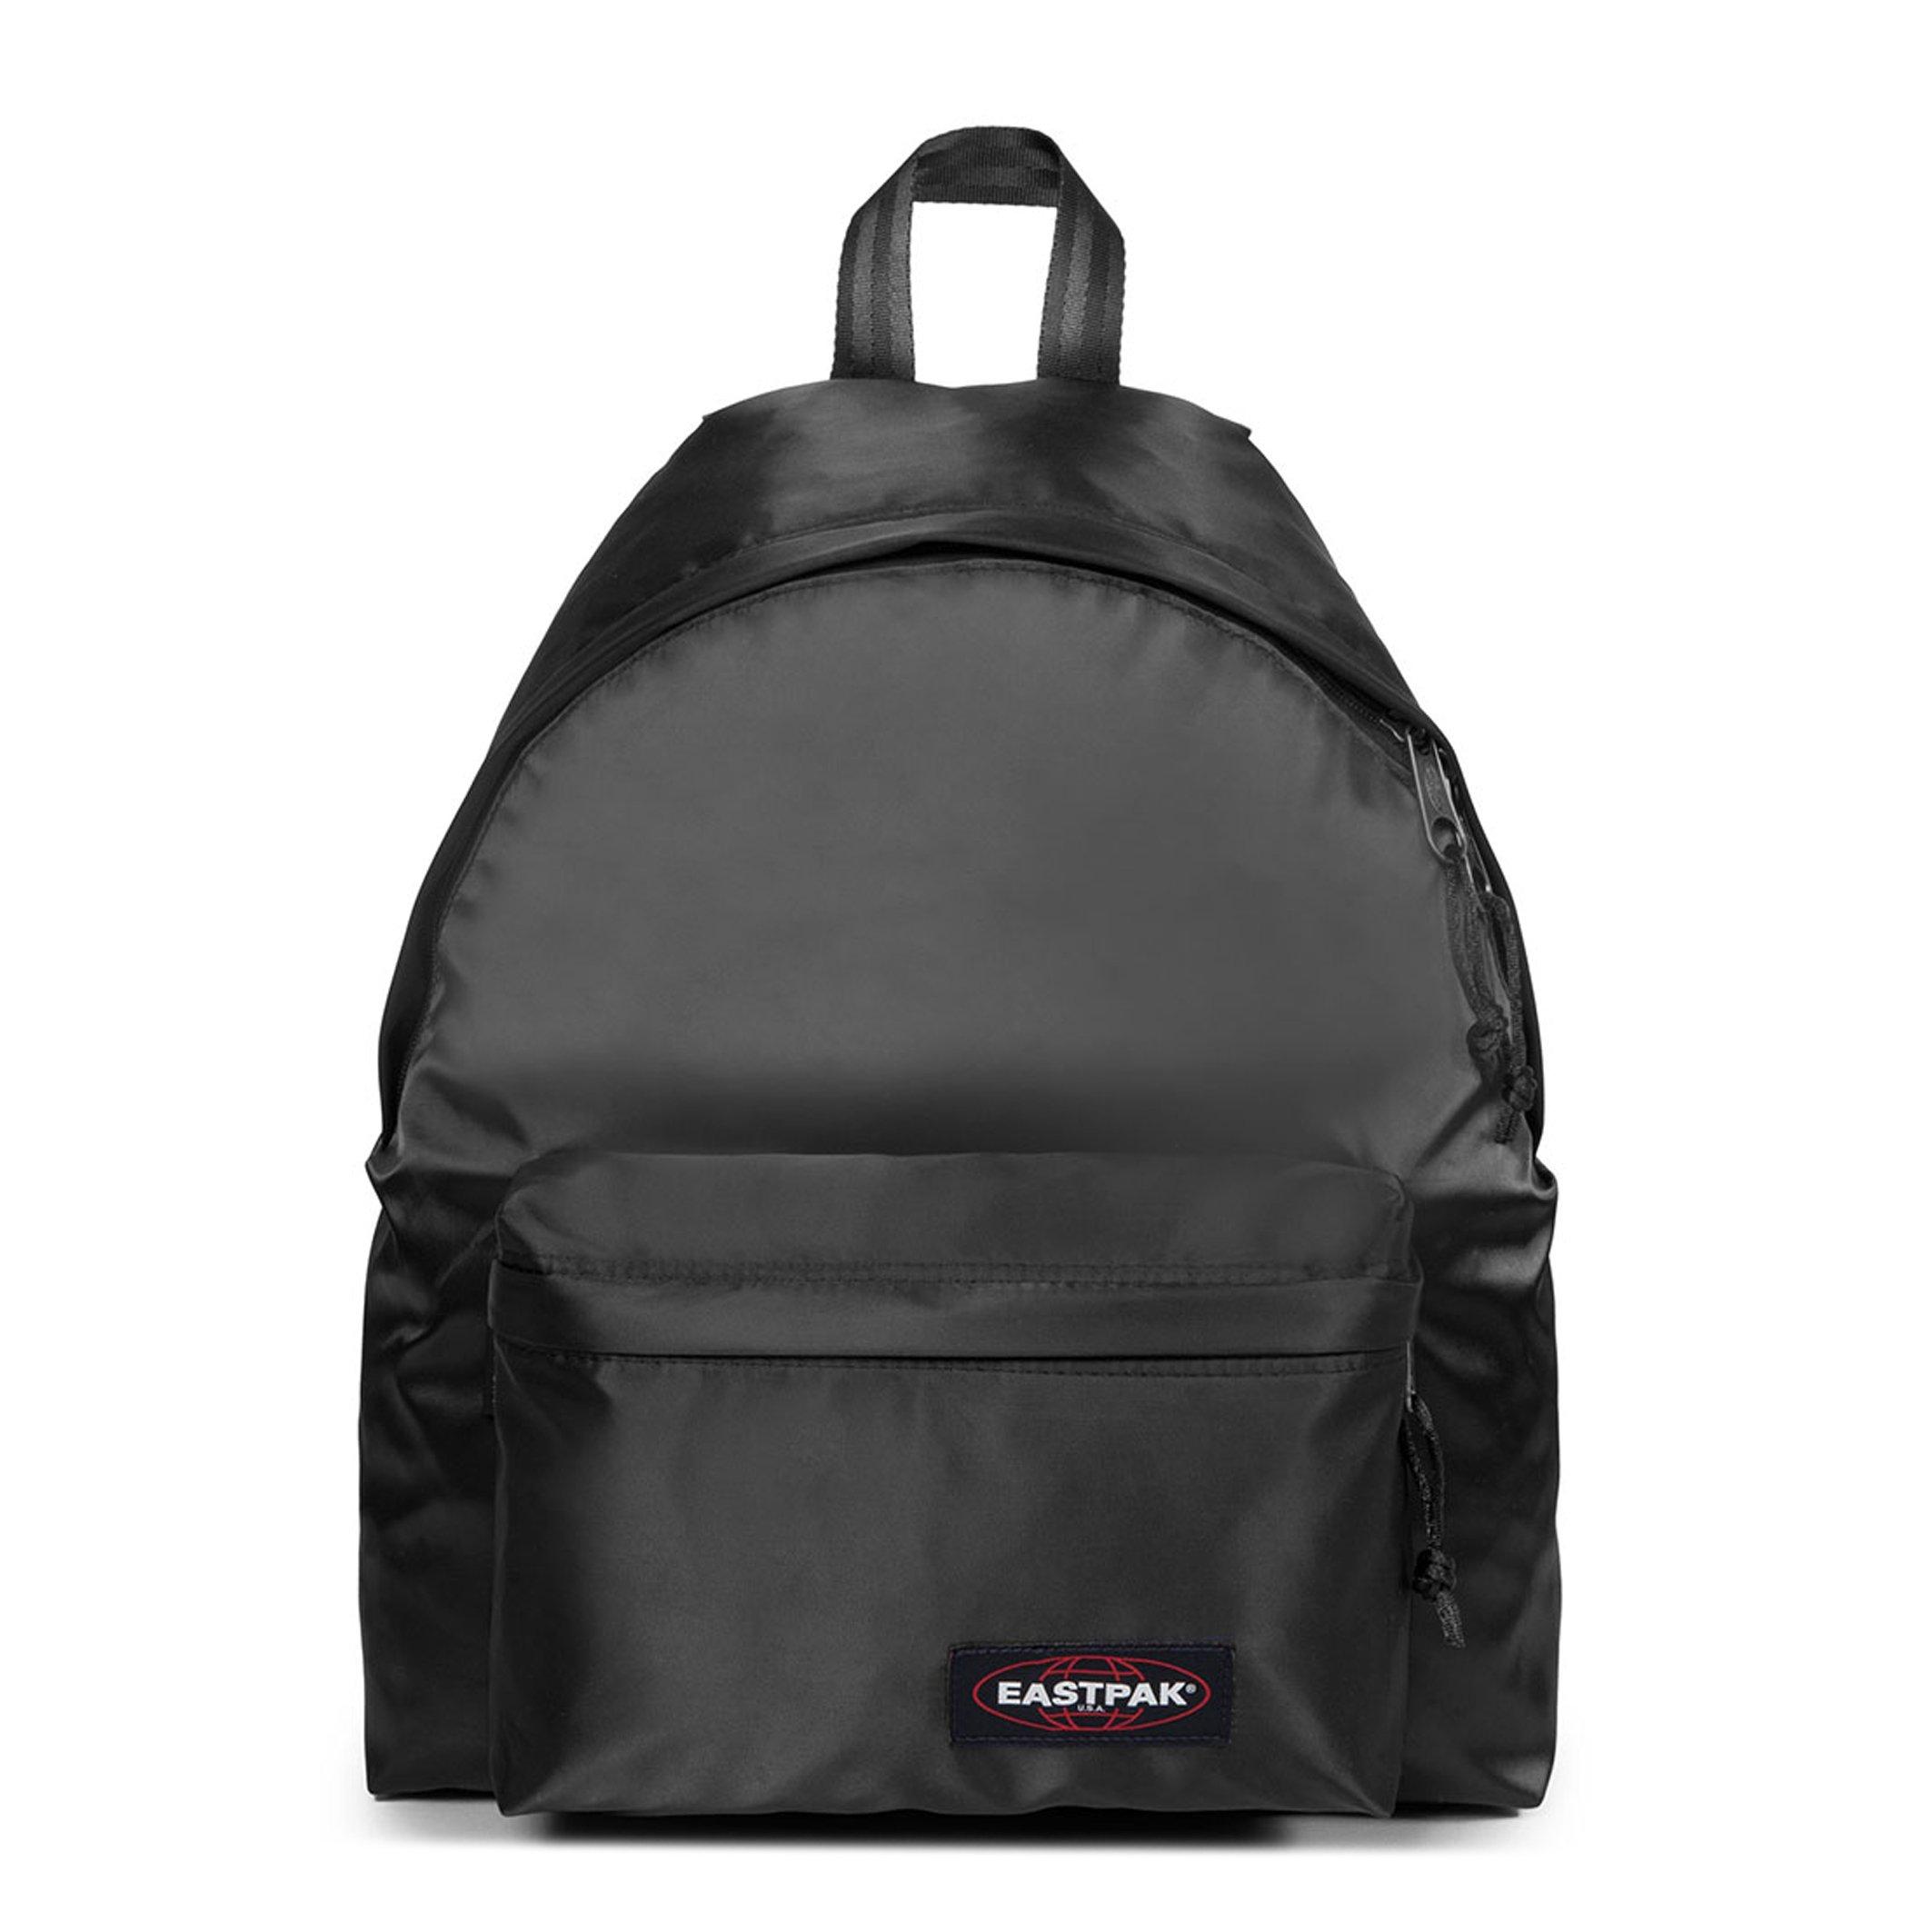 Eastpak Unsiex PADDED-PAKR Backpack Various Colours EK620_C39 - black-1 NOSIZE